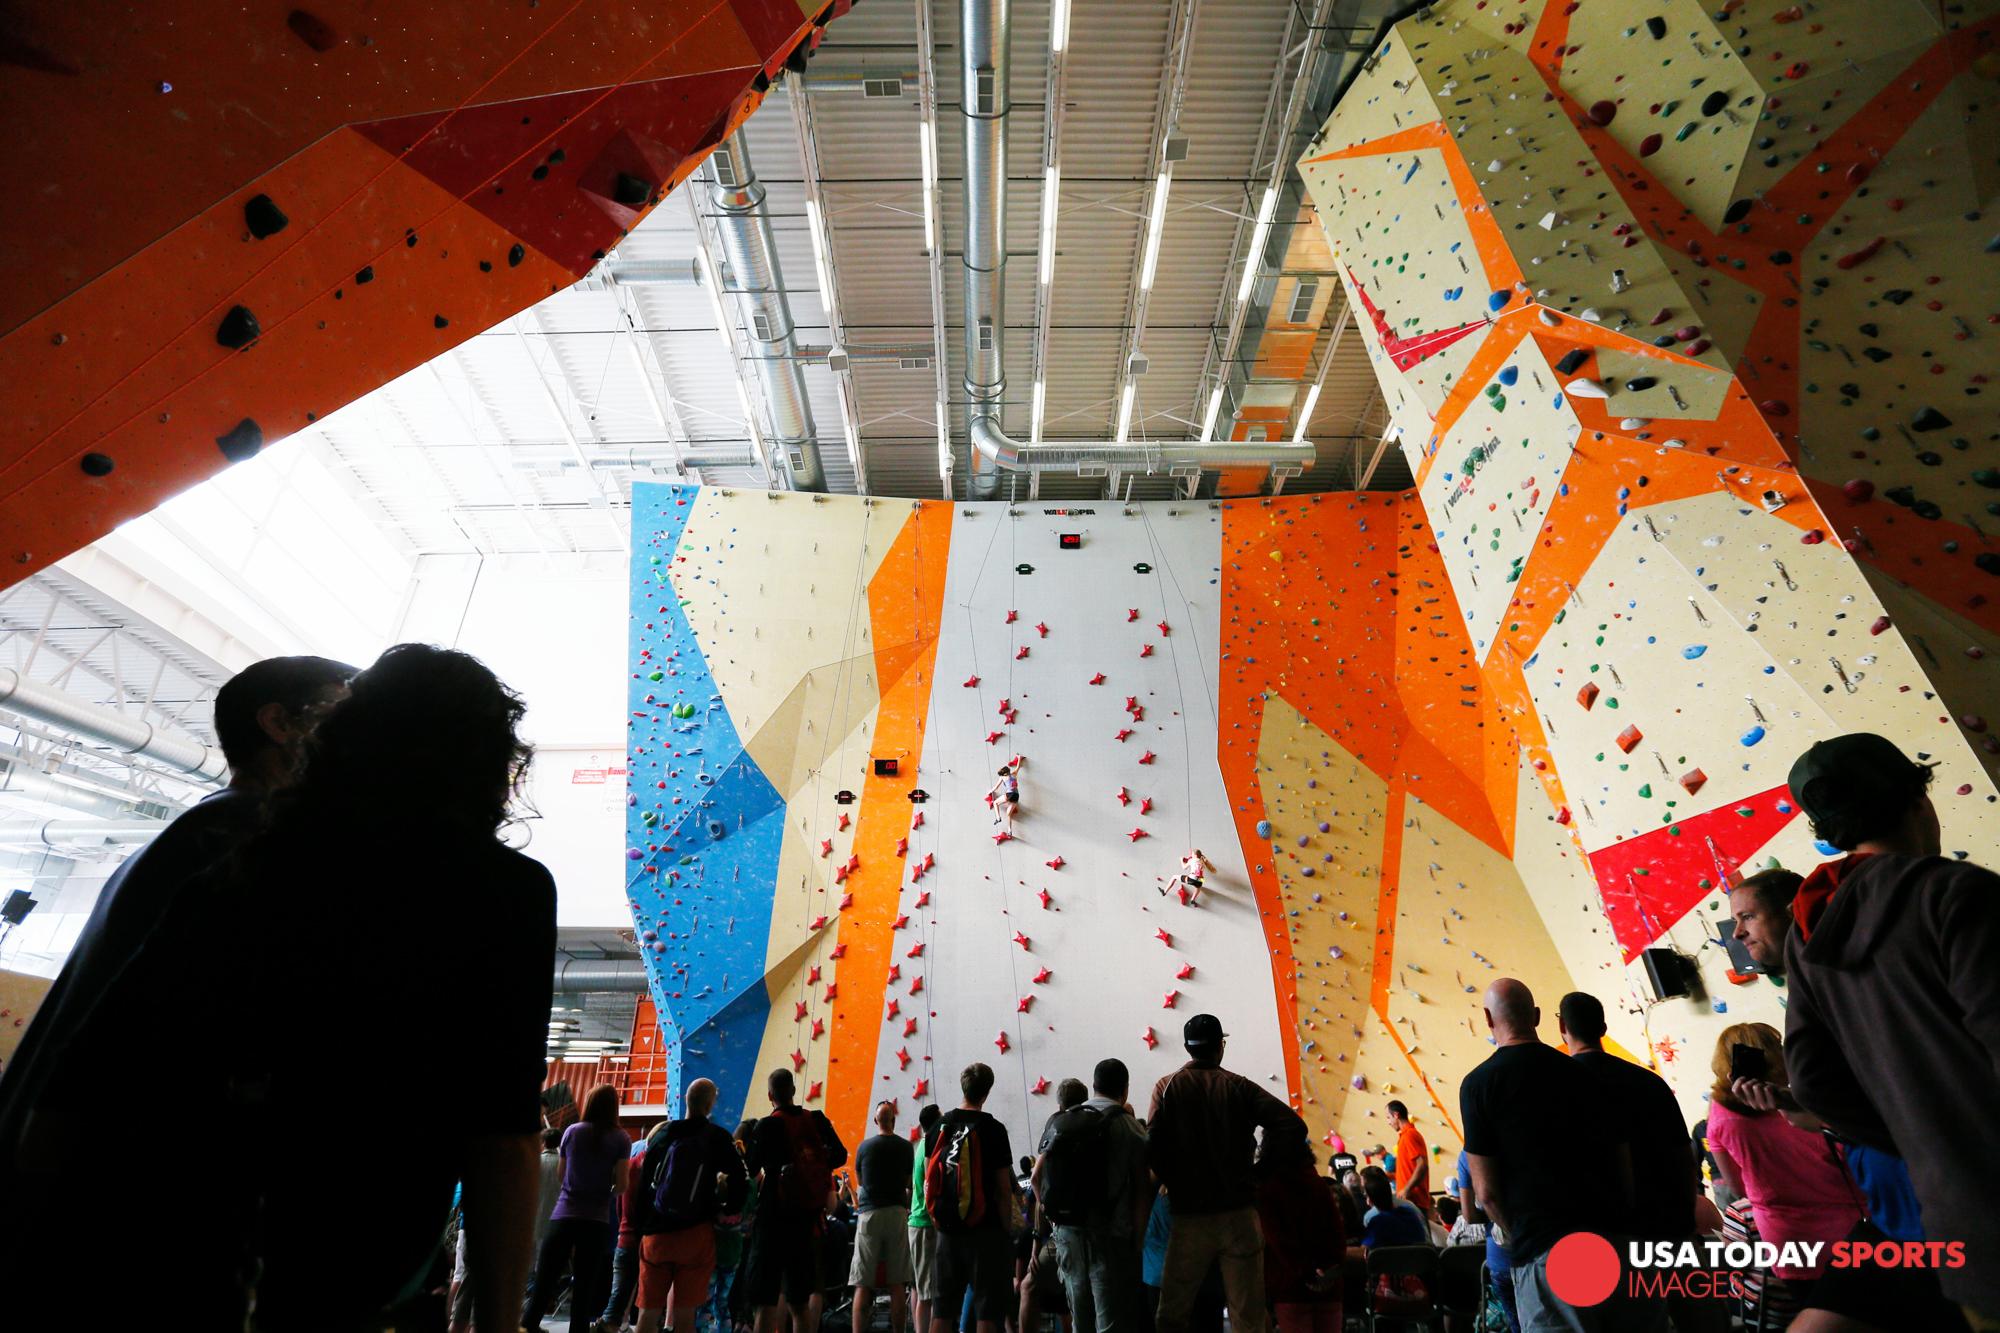 Garrett_Reid_atlanta_advertising_commercial_photographer_sport_and_speed_youth_national_chap_climbing-1.jpg